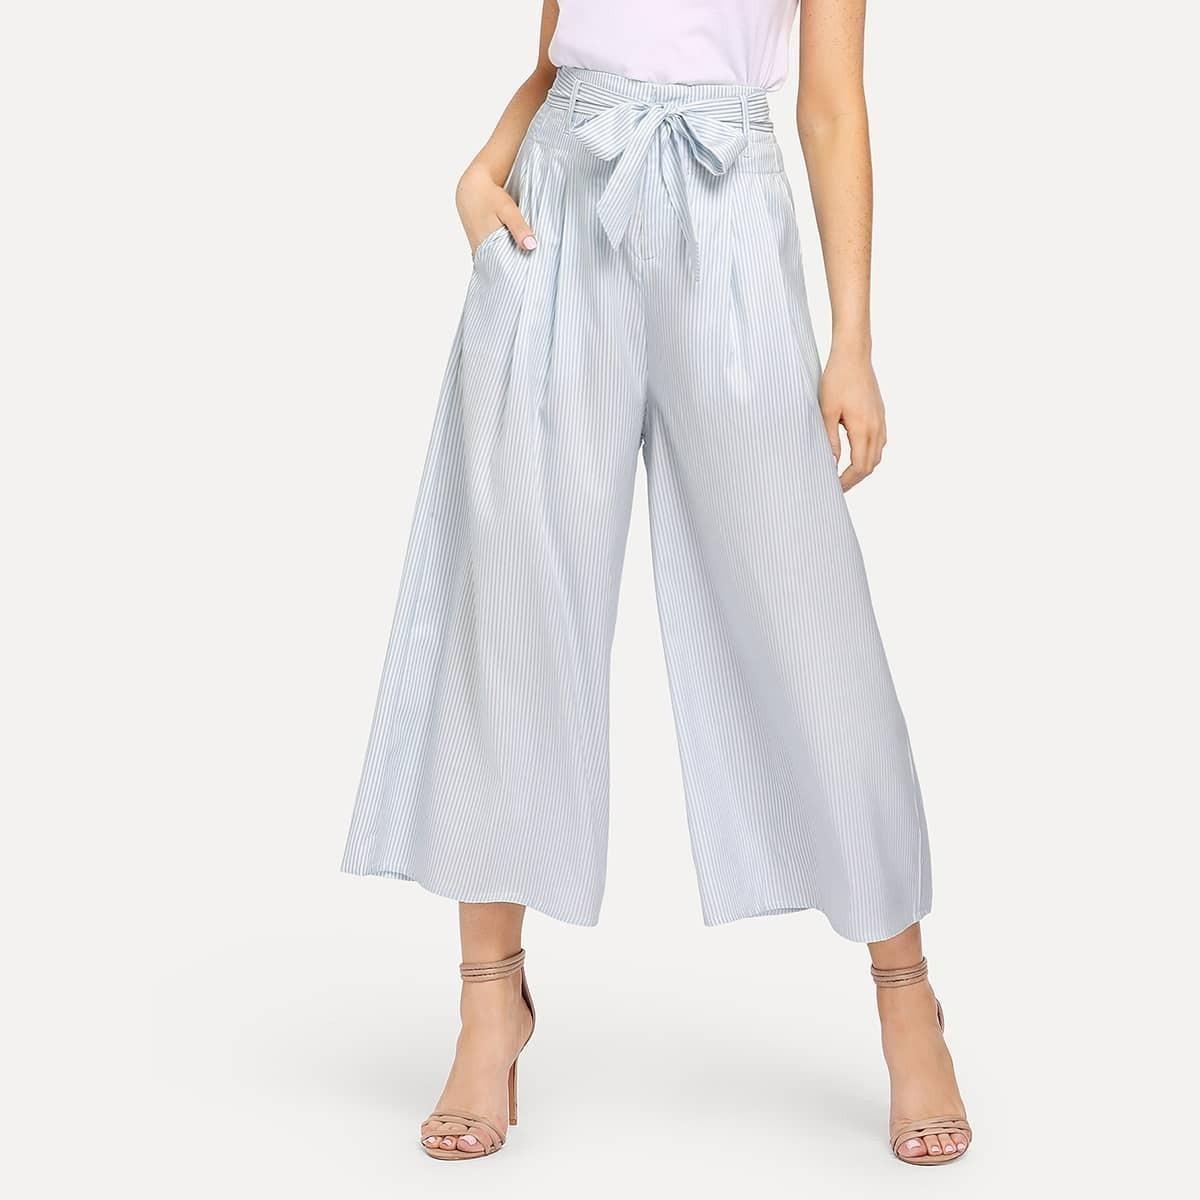 - VerticalStriped Culotte Pants